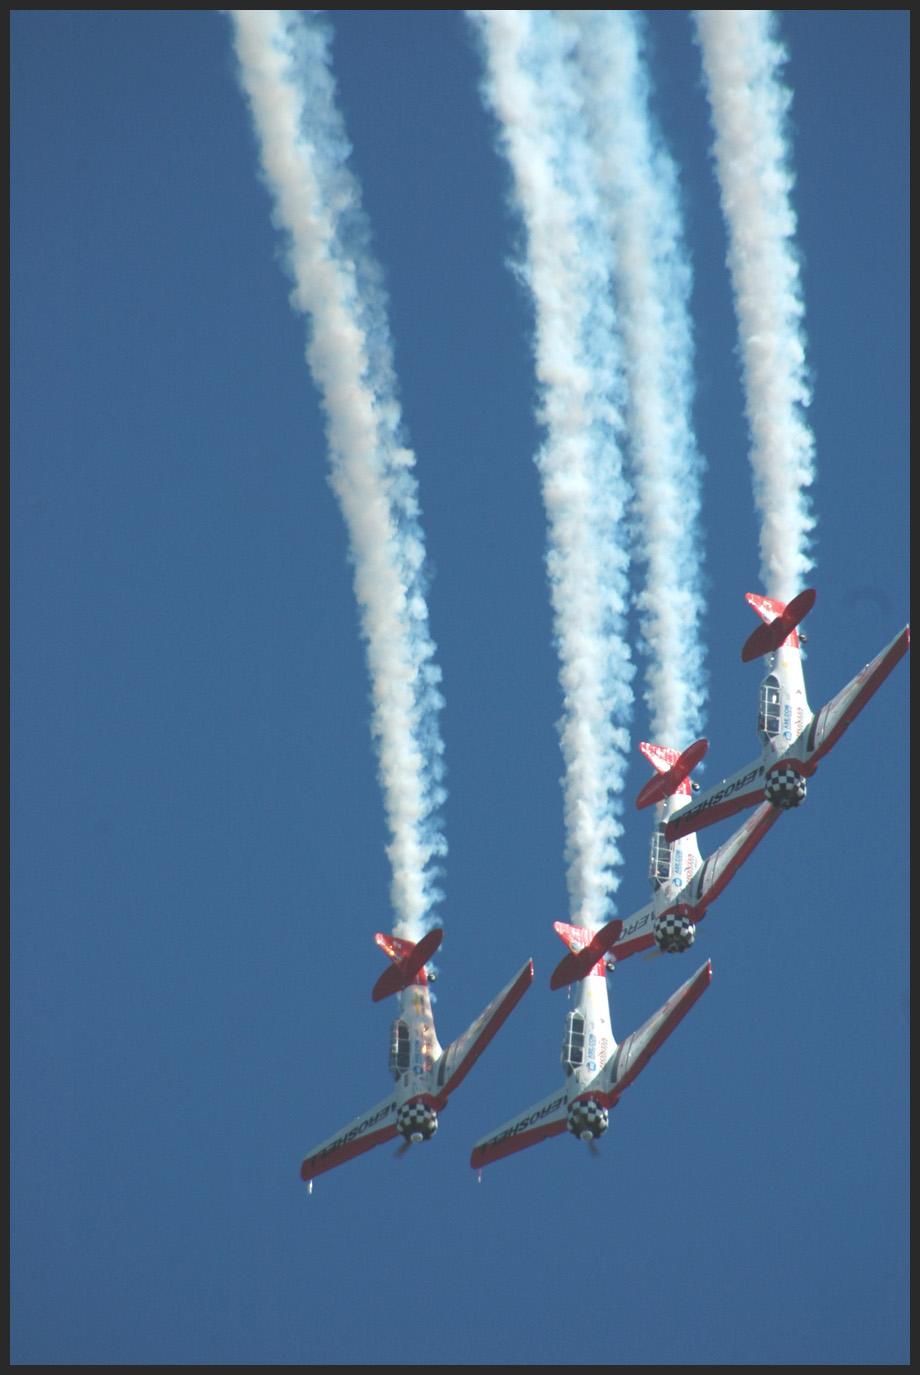 Aerobatic display straight down